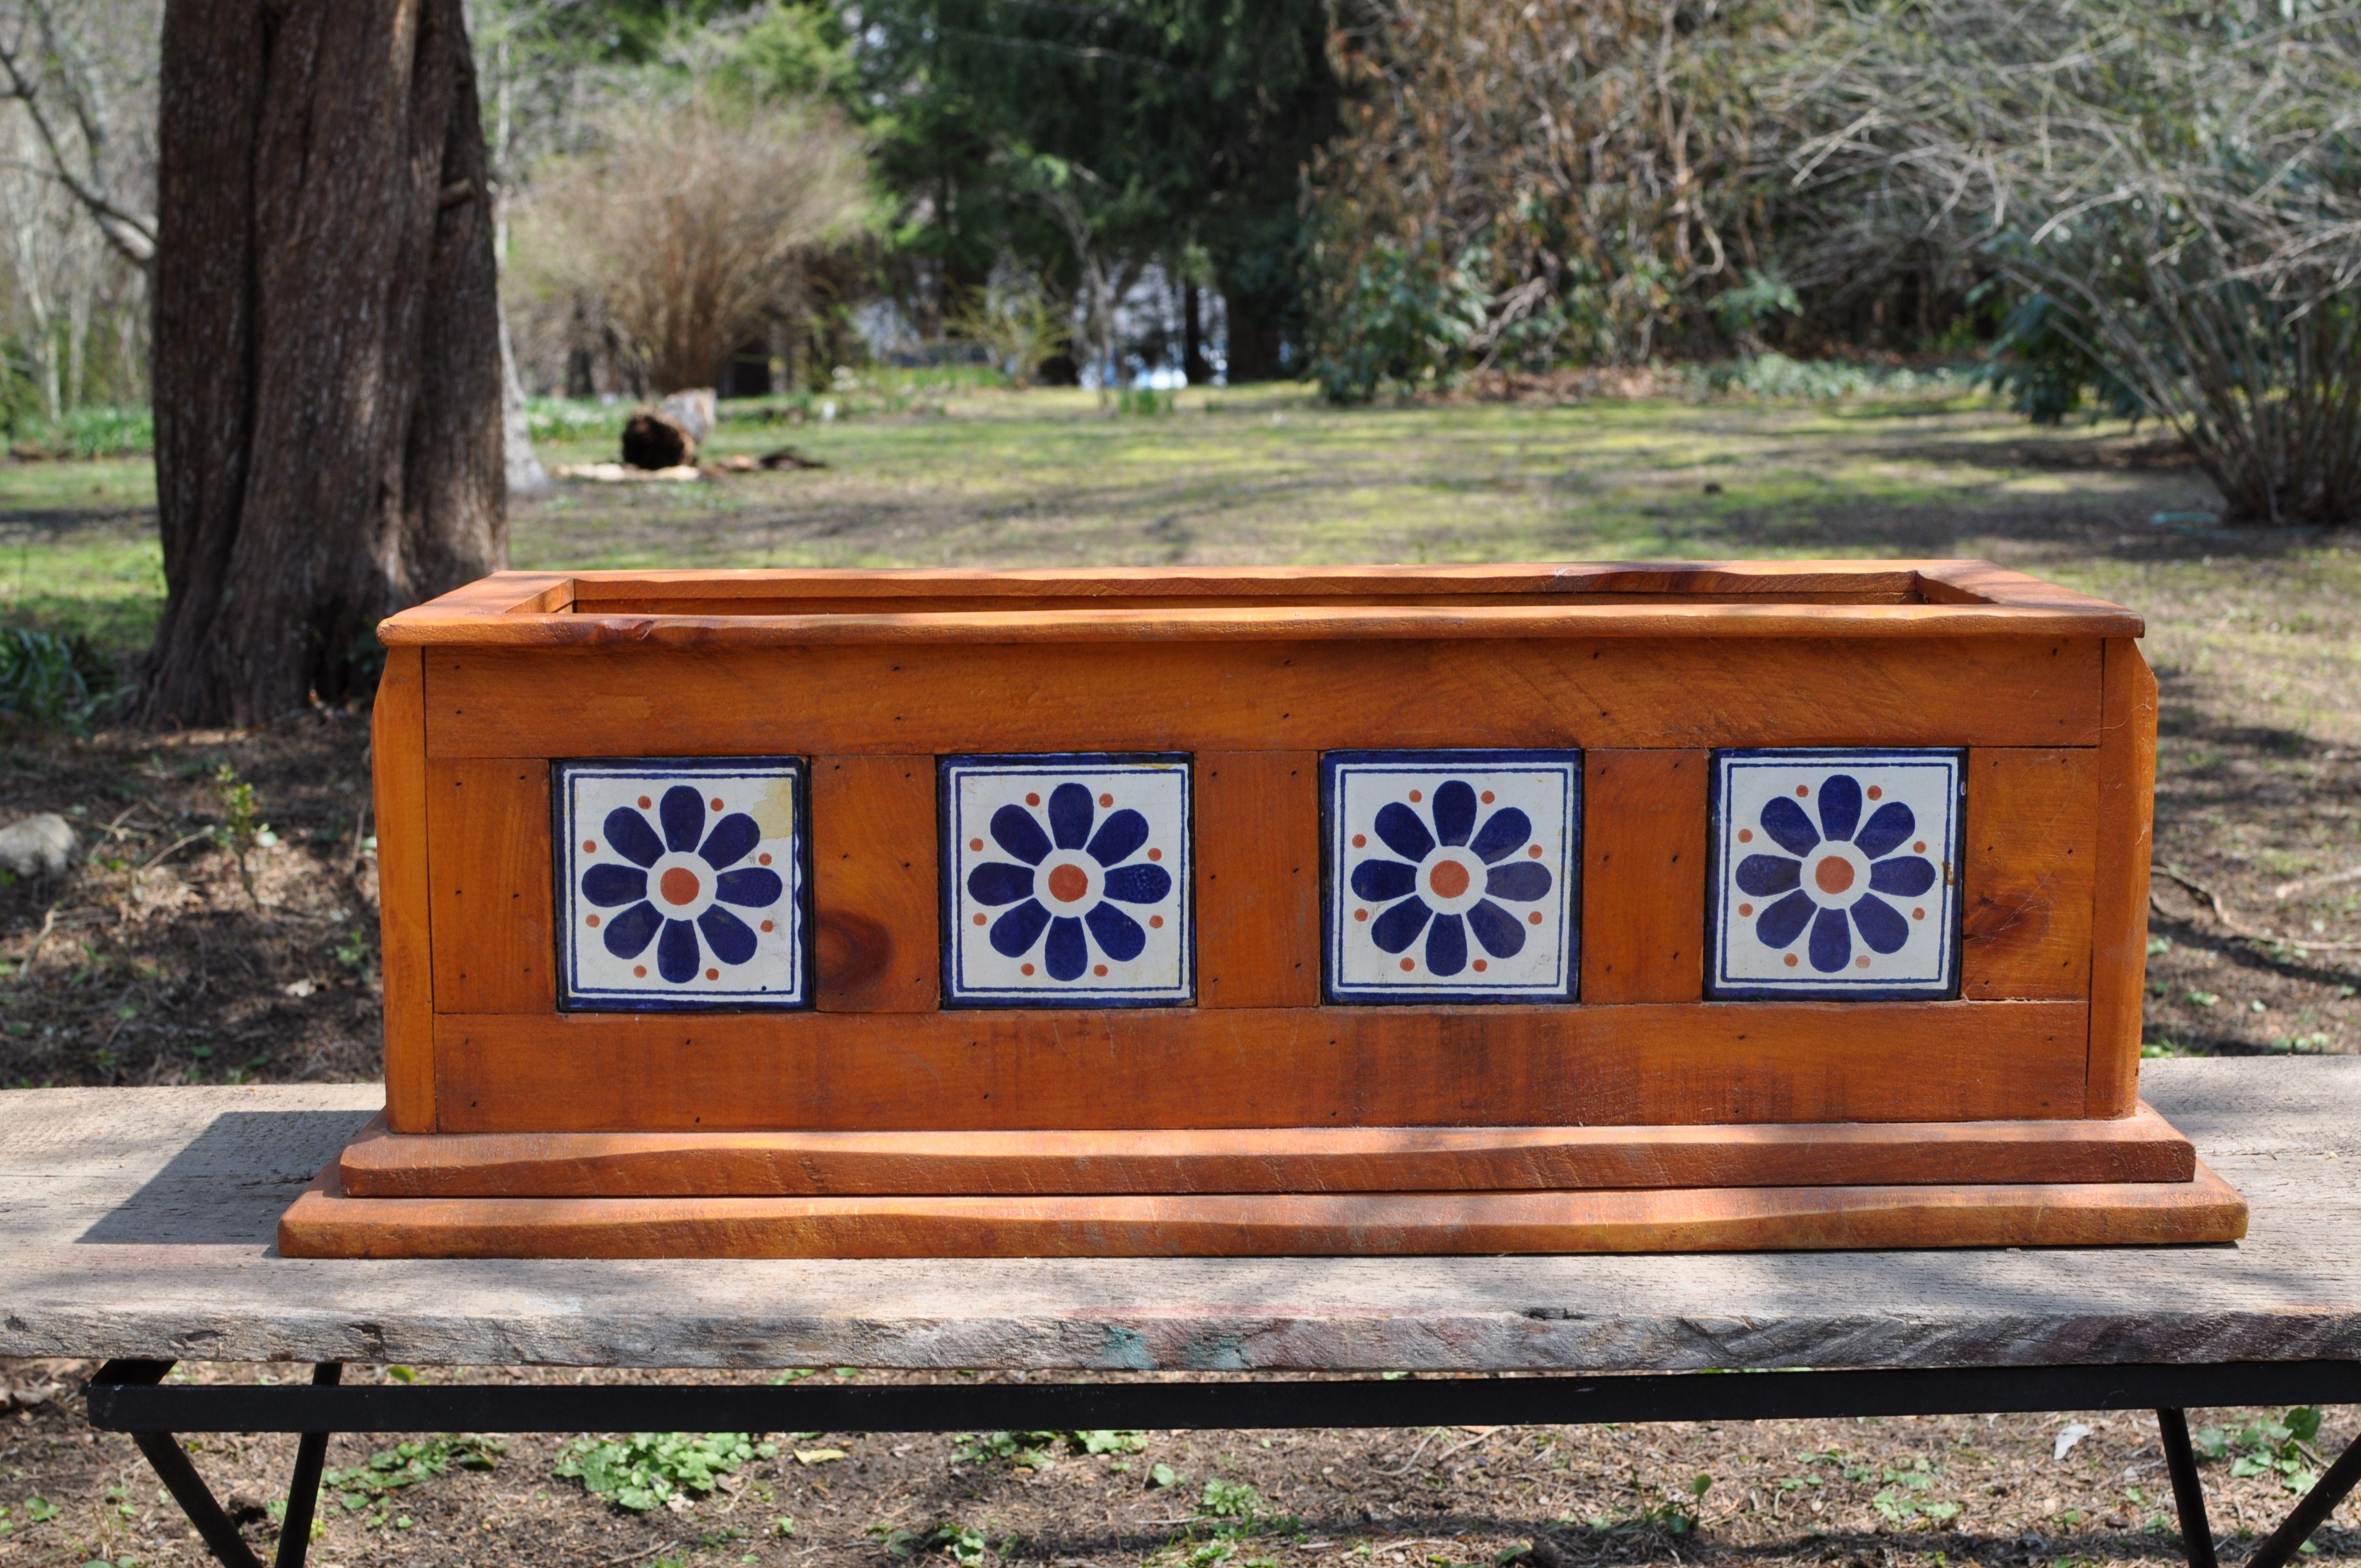 Mexican Talavera Tile Planter Window planters